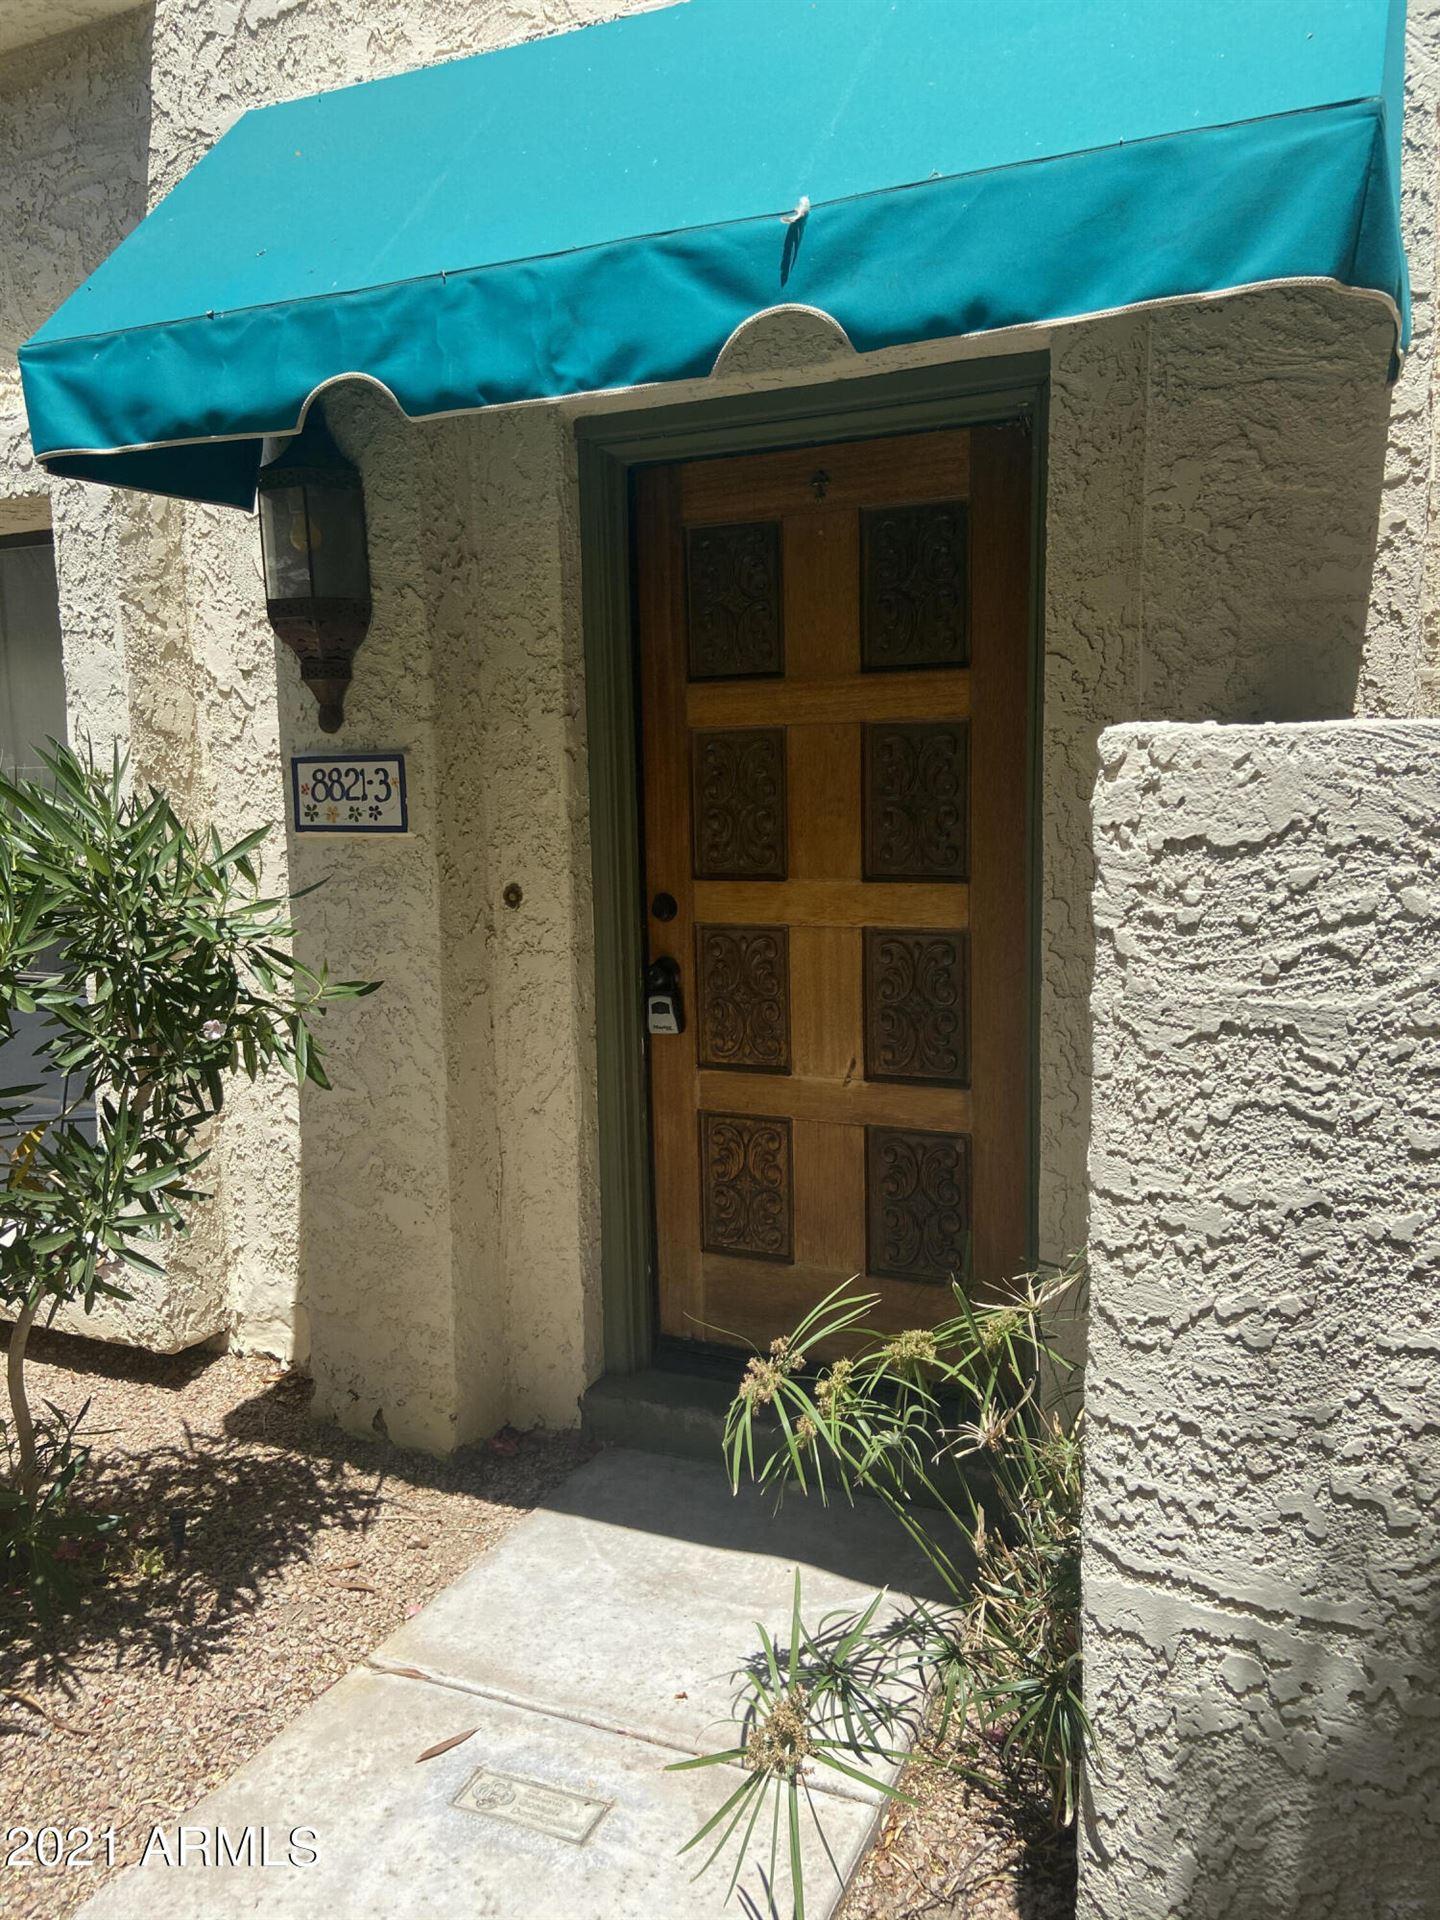 8821 S 48TH Street #3, Phoenix, AZ 85044 - MLS#: 6238603